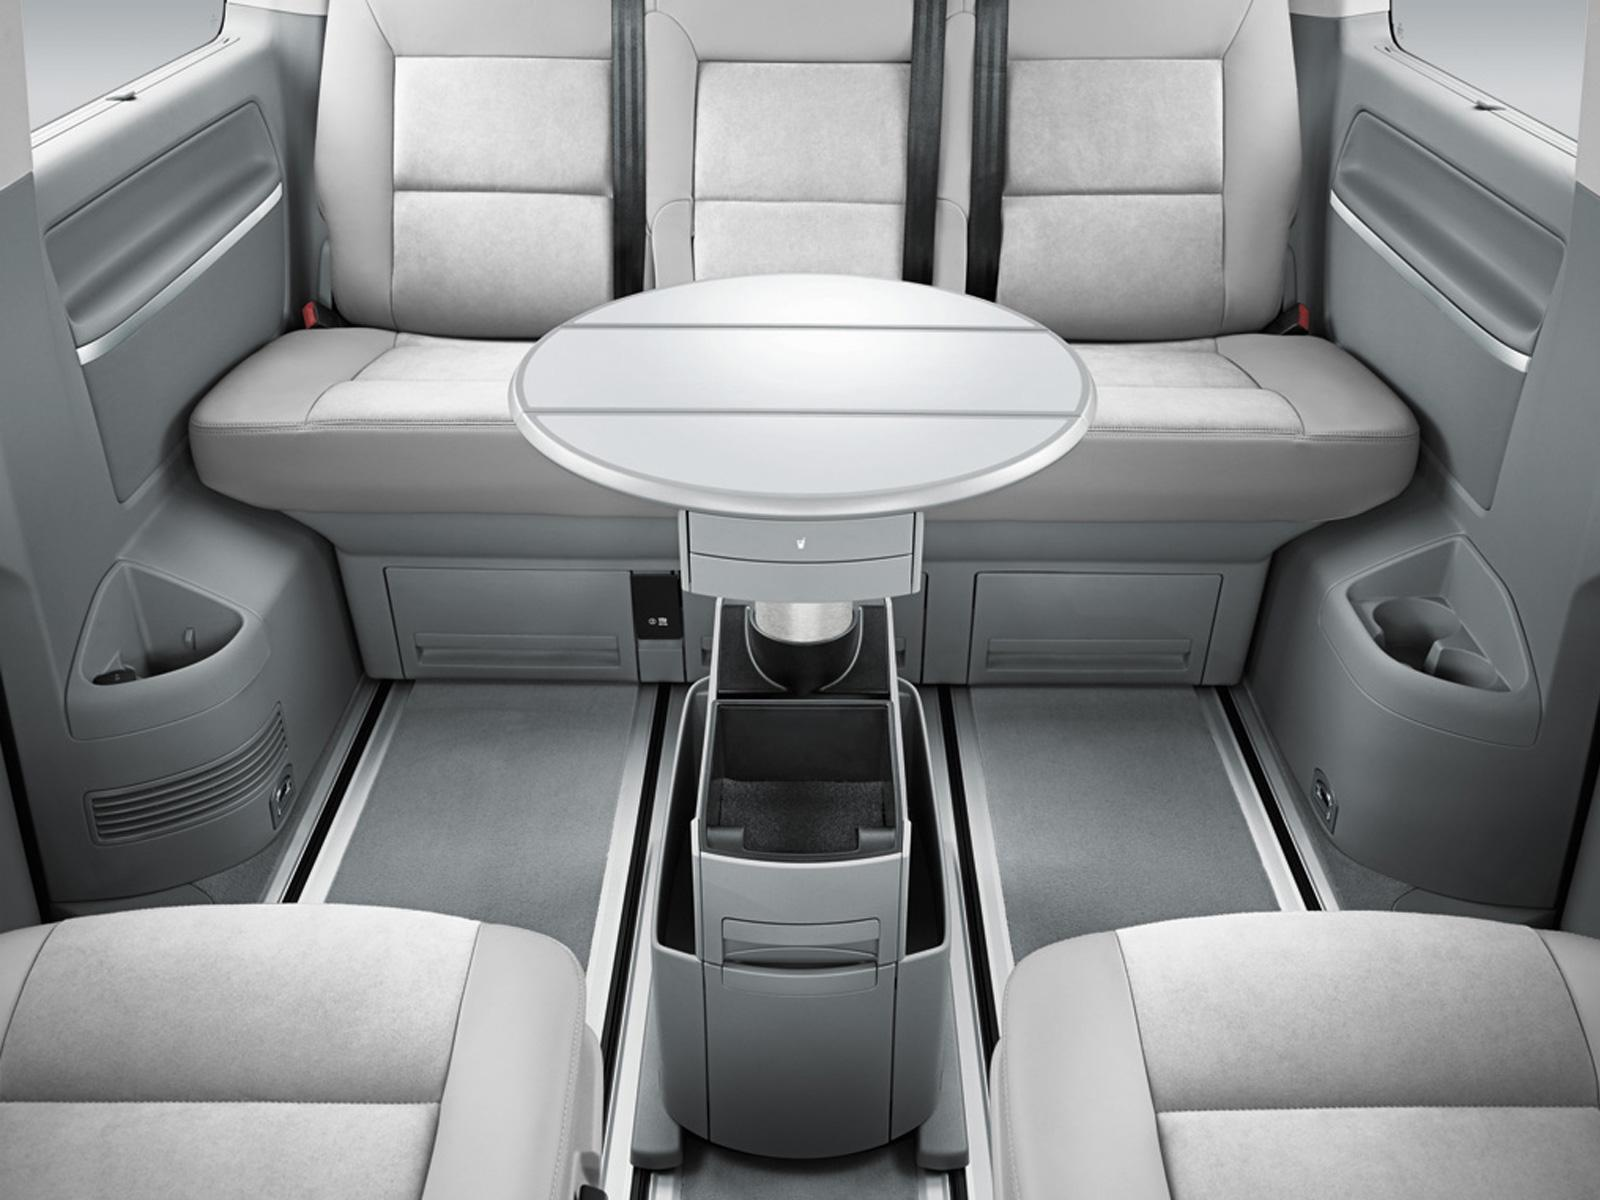 volkswagen multivan 2012 llega a m xico. Black Bedroom Furniture Sets. Home Design Ideas